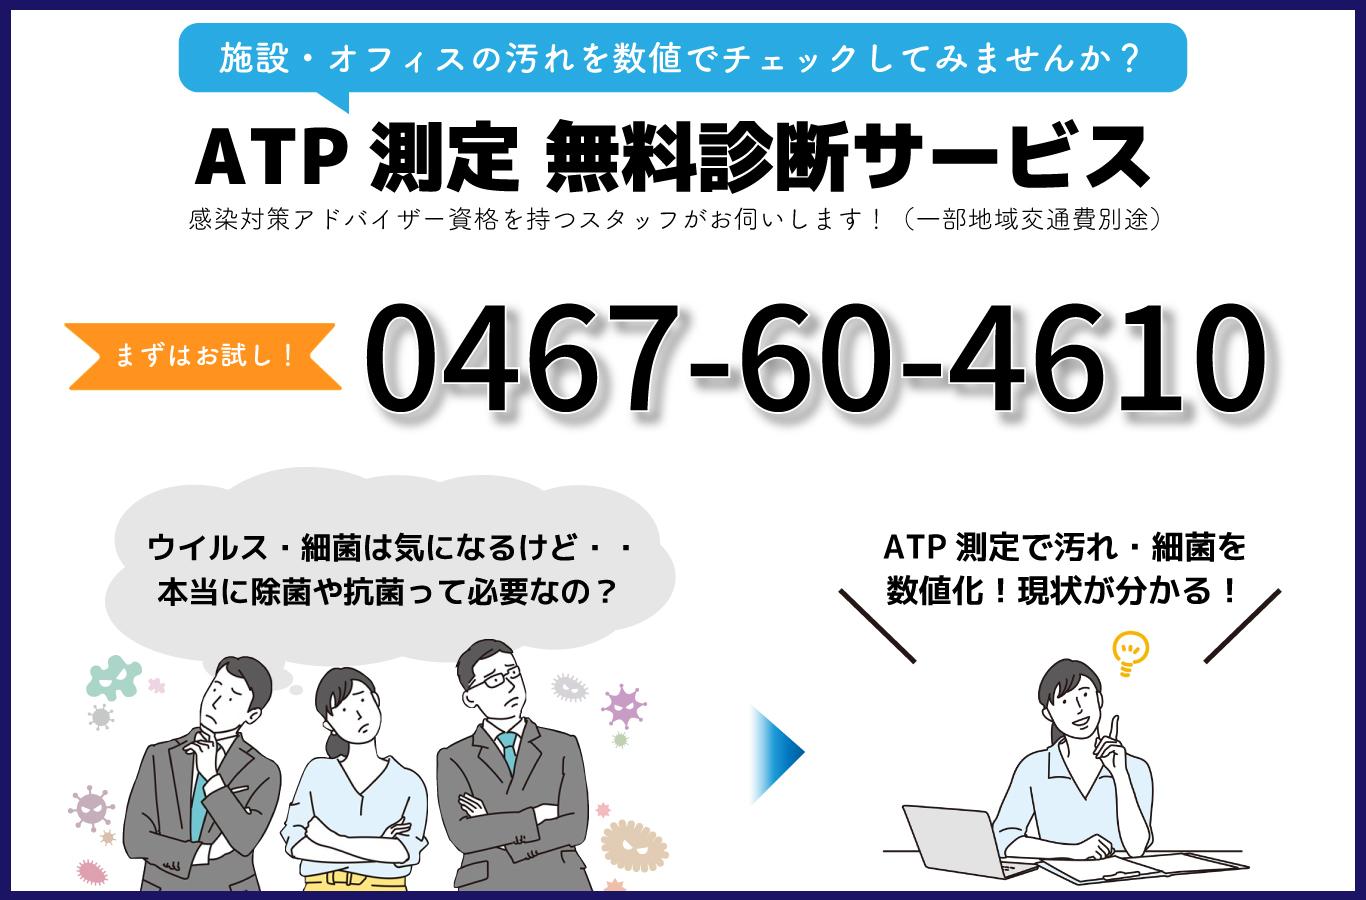 &SHIELD除菌清掃抗菌コーティングサービス ATP検査無料診断ご案内